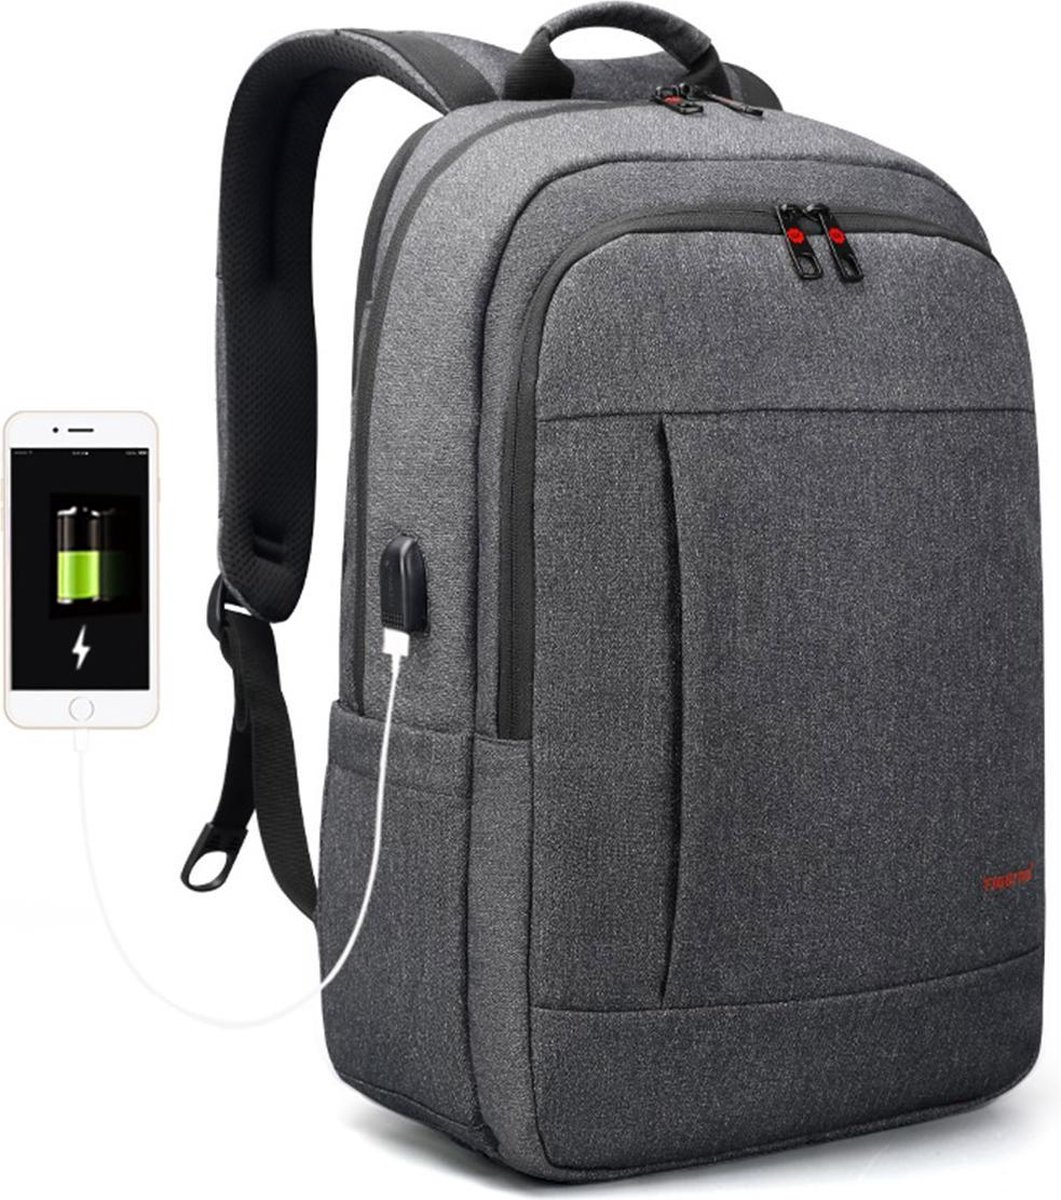 Tigernu Business II laptop rugzak - anti diefstal rugzak - t/m 17 inch - waterafstotend - grijs